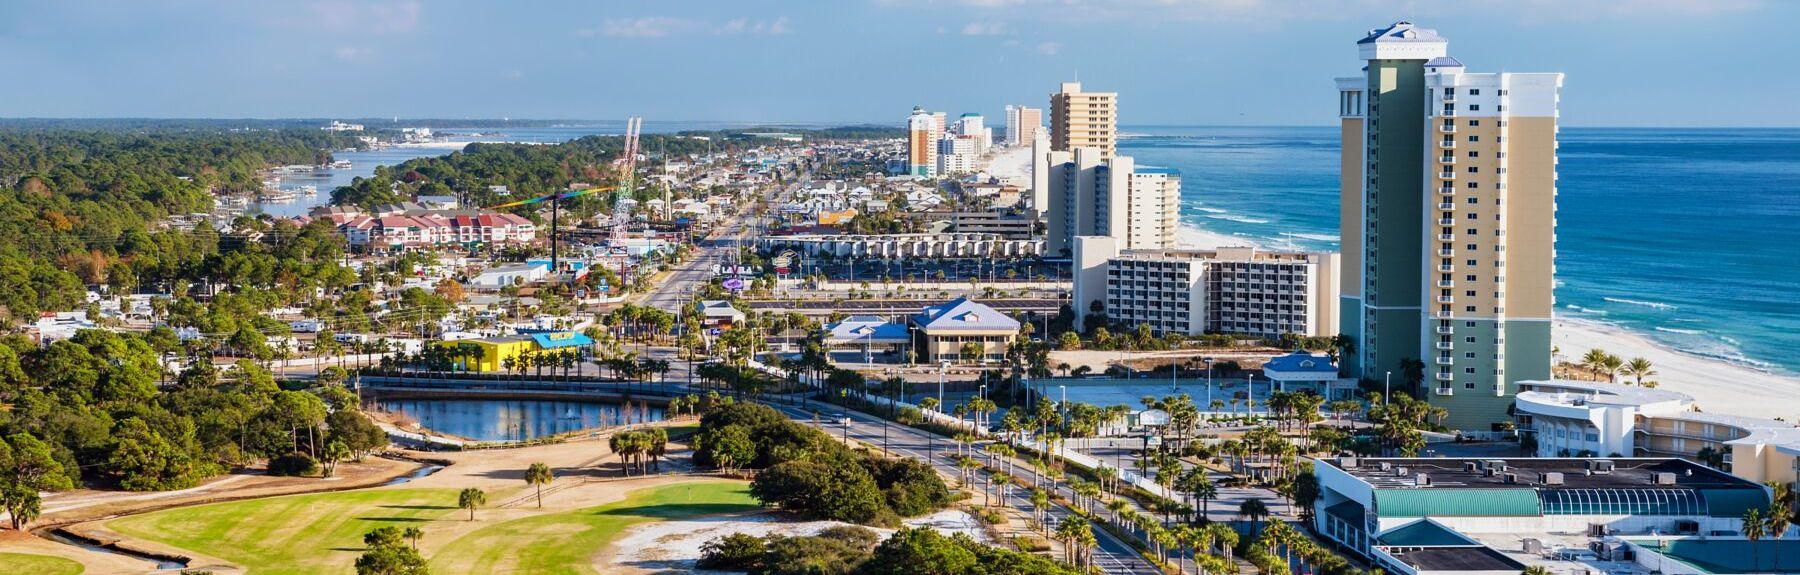 Vrbo Panama City Fl Vacation Rentals House Rentals More